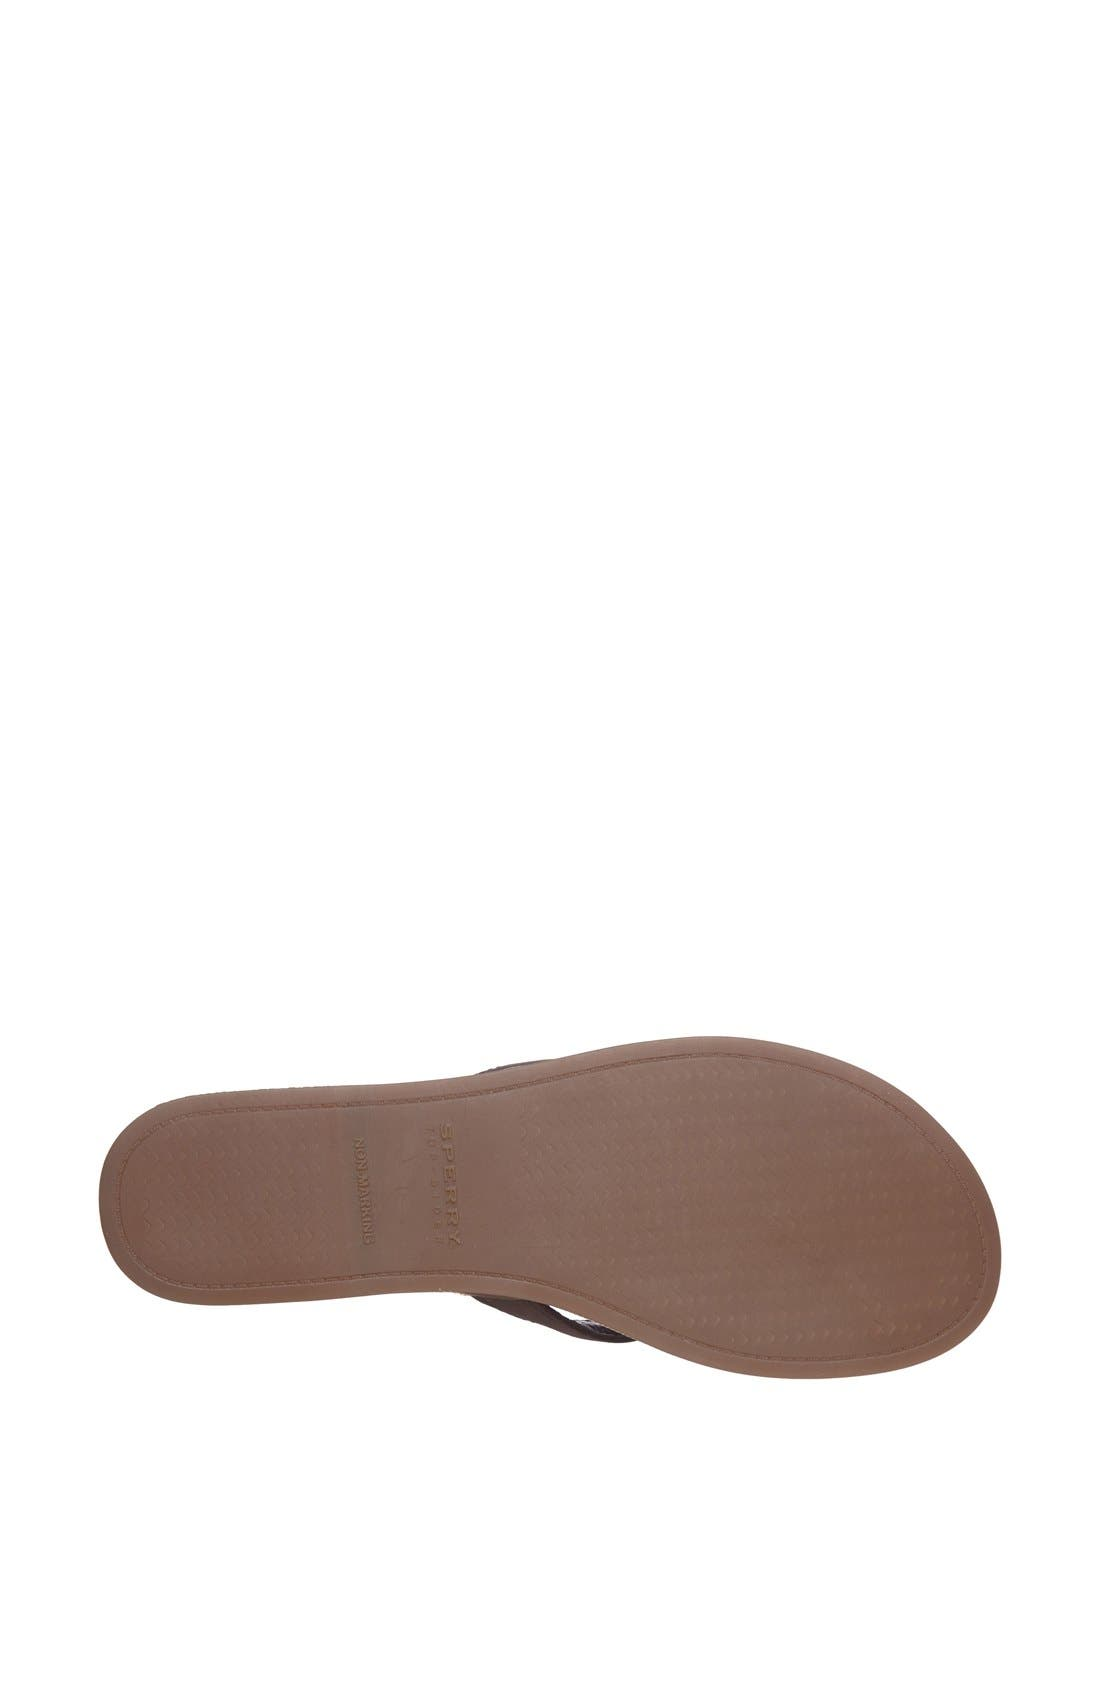 Alternate Image 3  - Sperry Top-Sider® 'Calla' Sandal